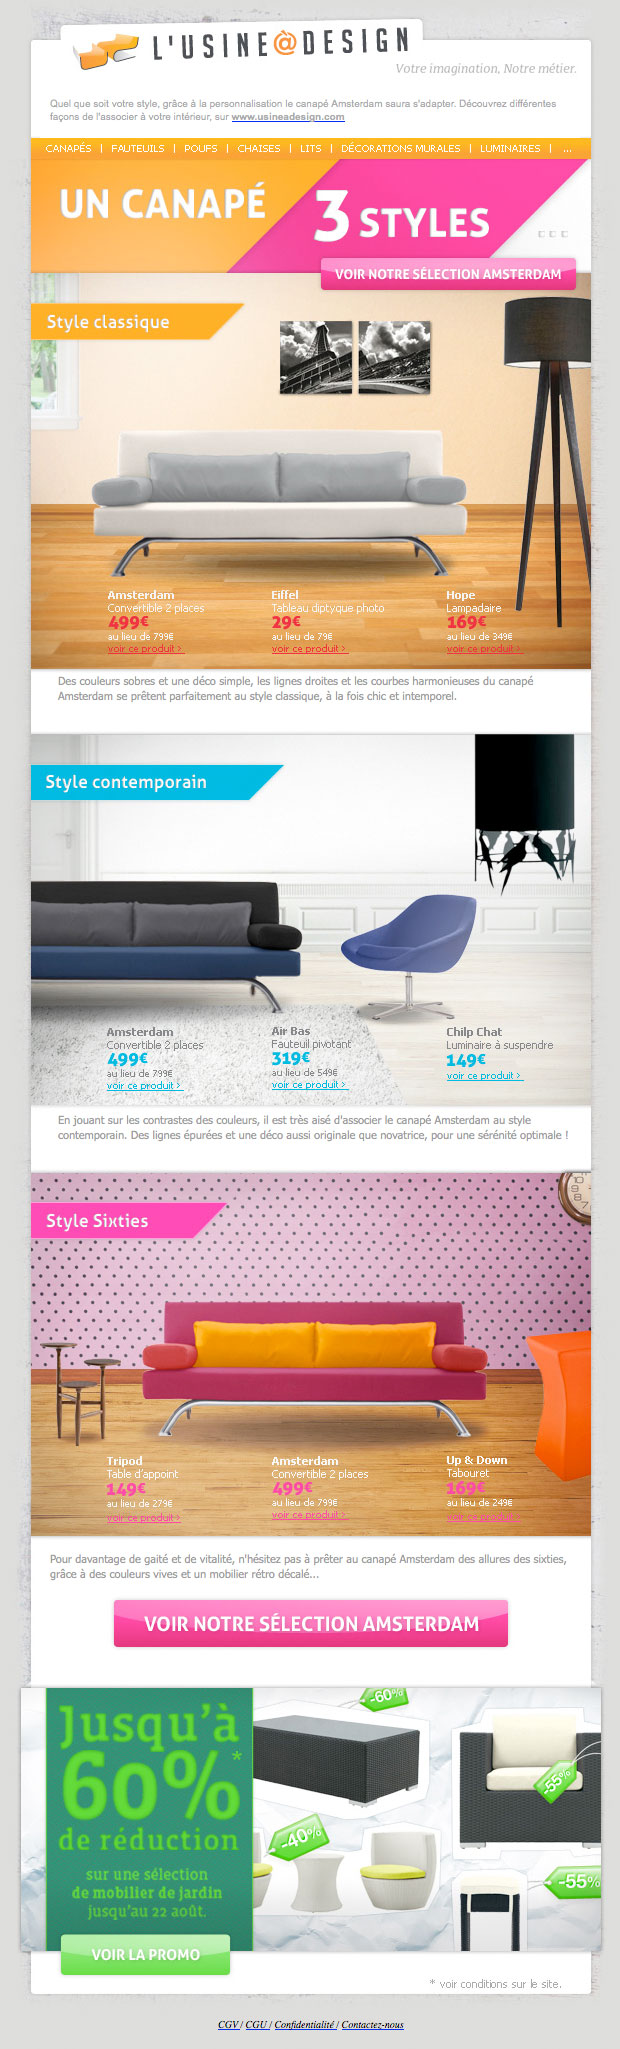 galerie de newsletters de la marque the mailing book. Black Bedroom Furniture Sets. Home Design Ideas